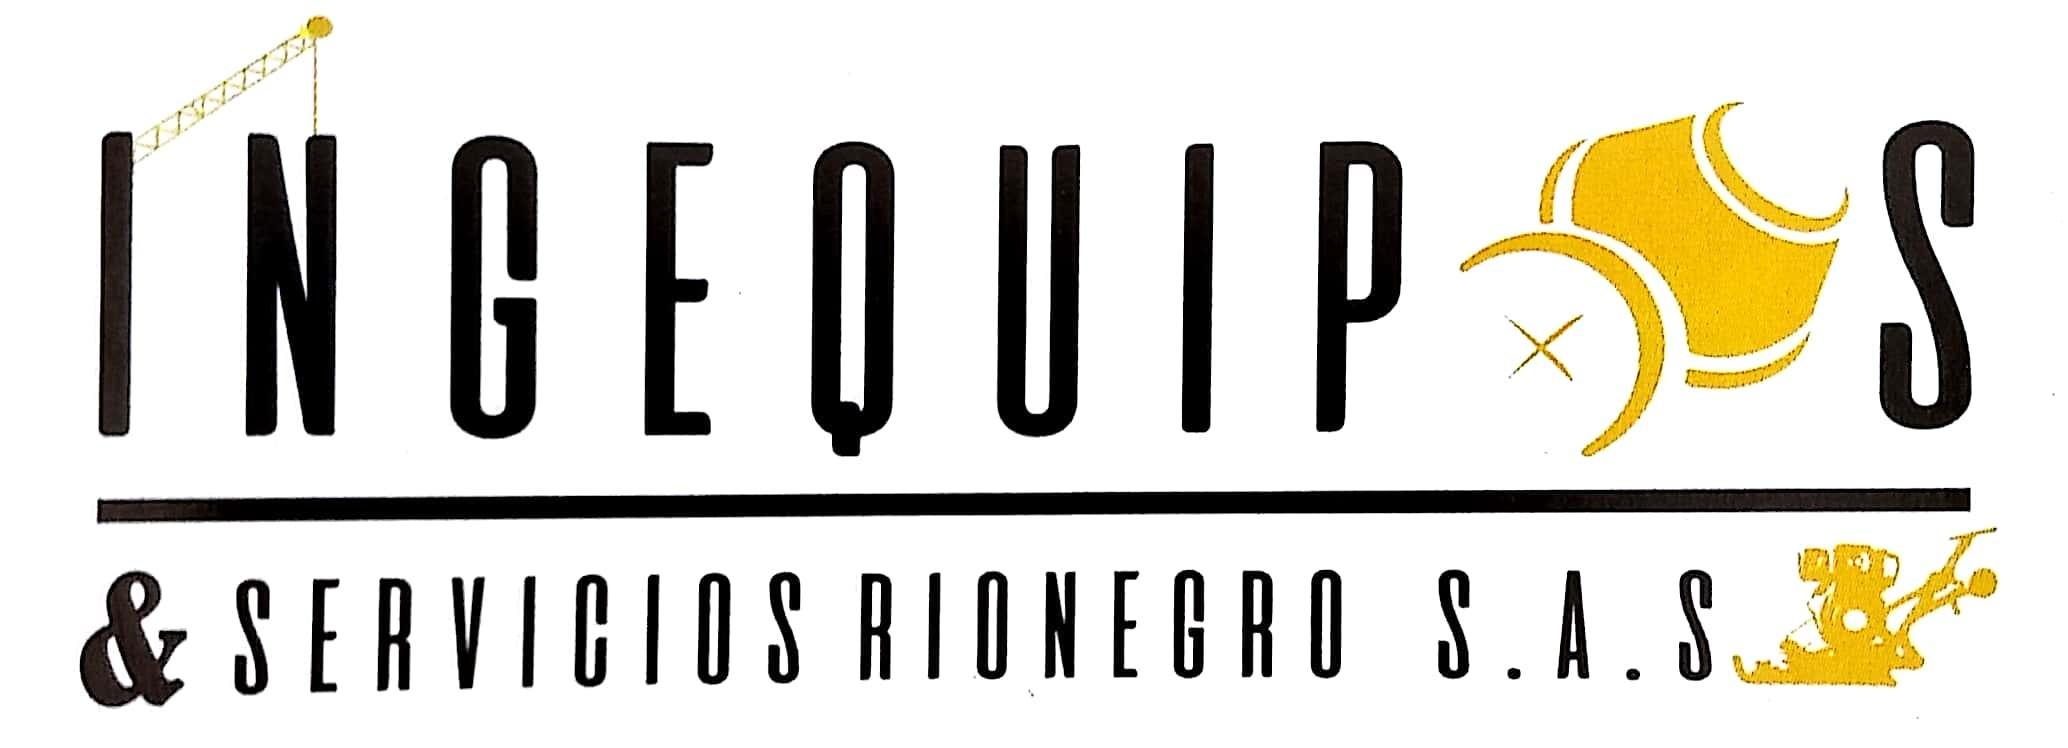 INGEQUIPOS & INGEQUIPOS RIONEGRO SAS